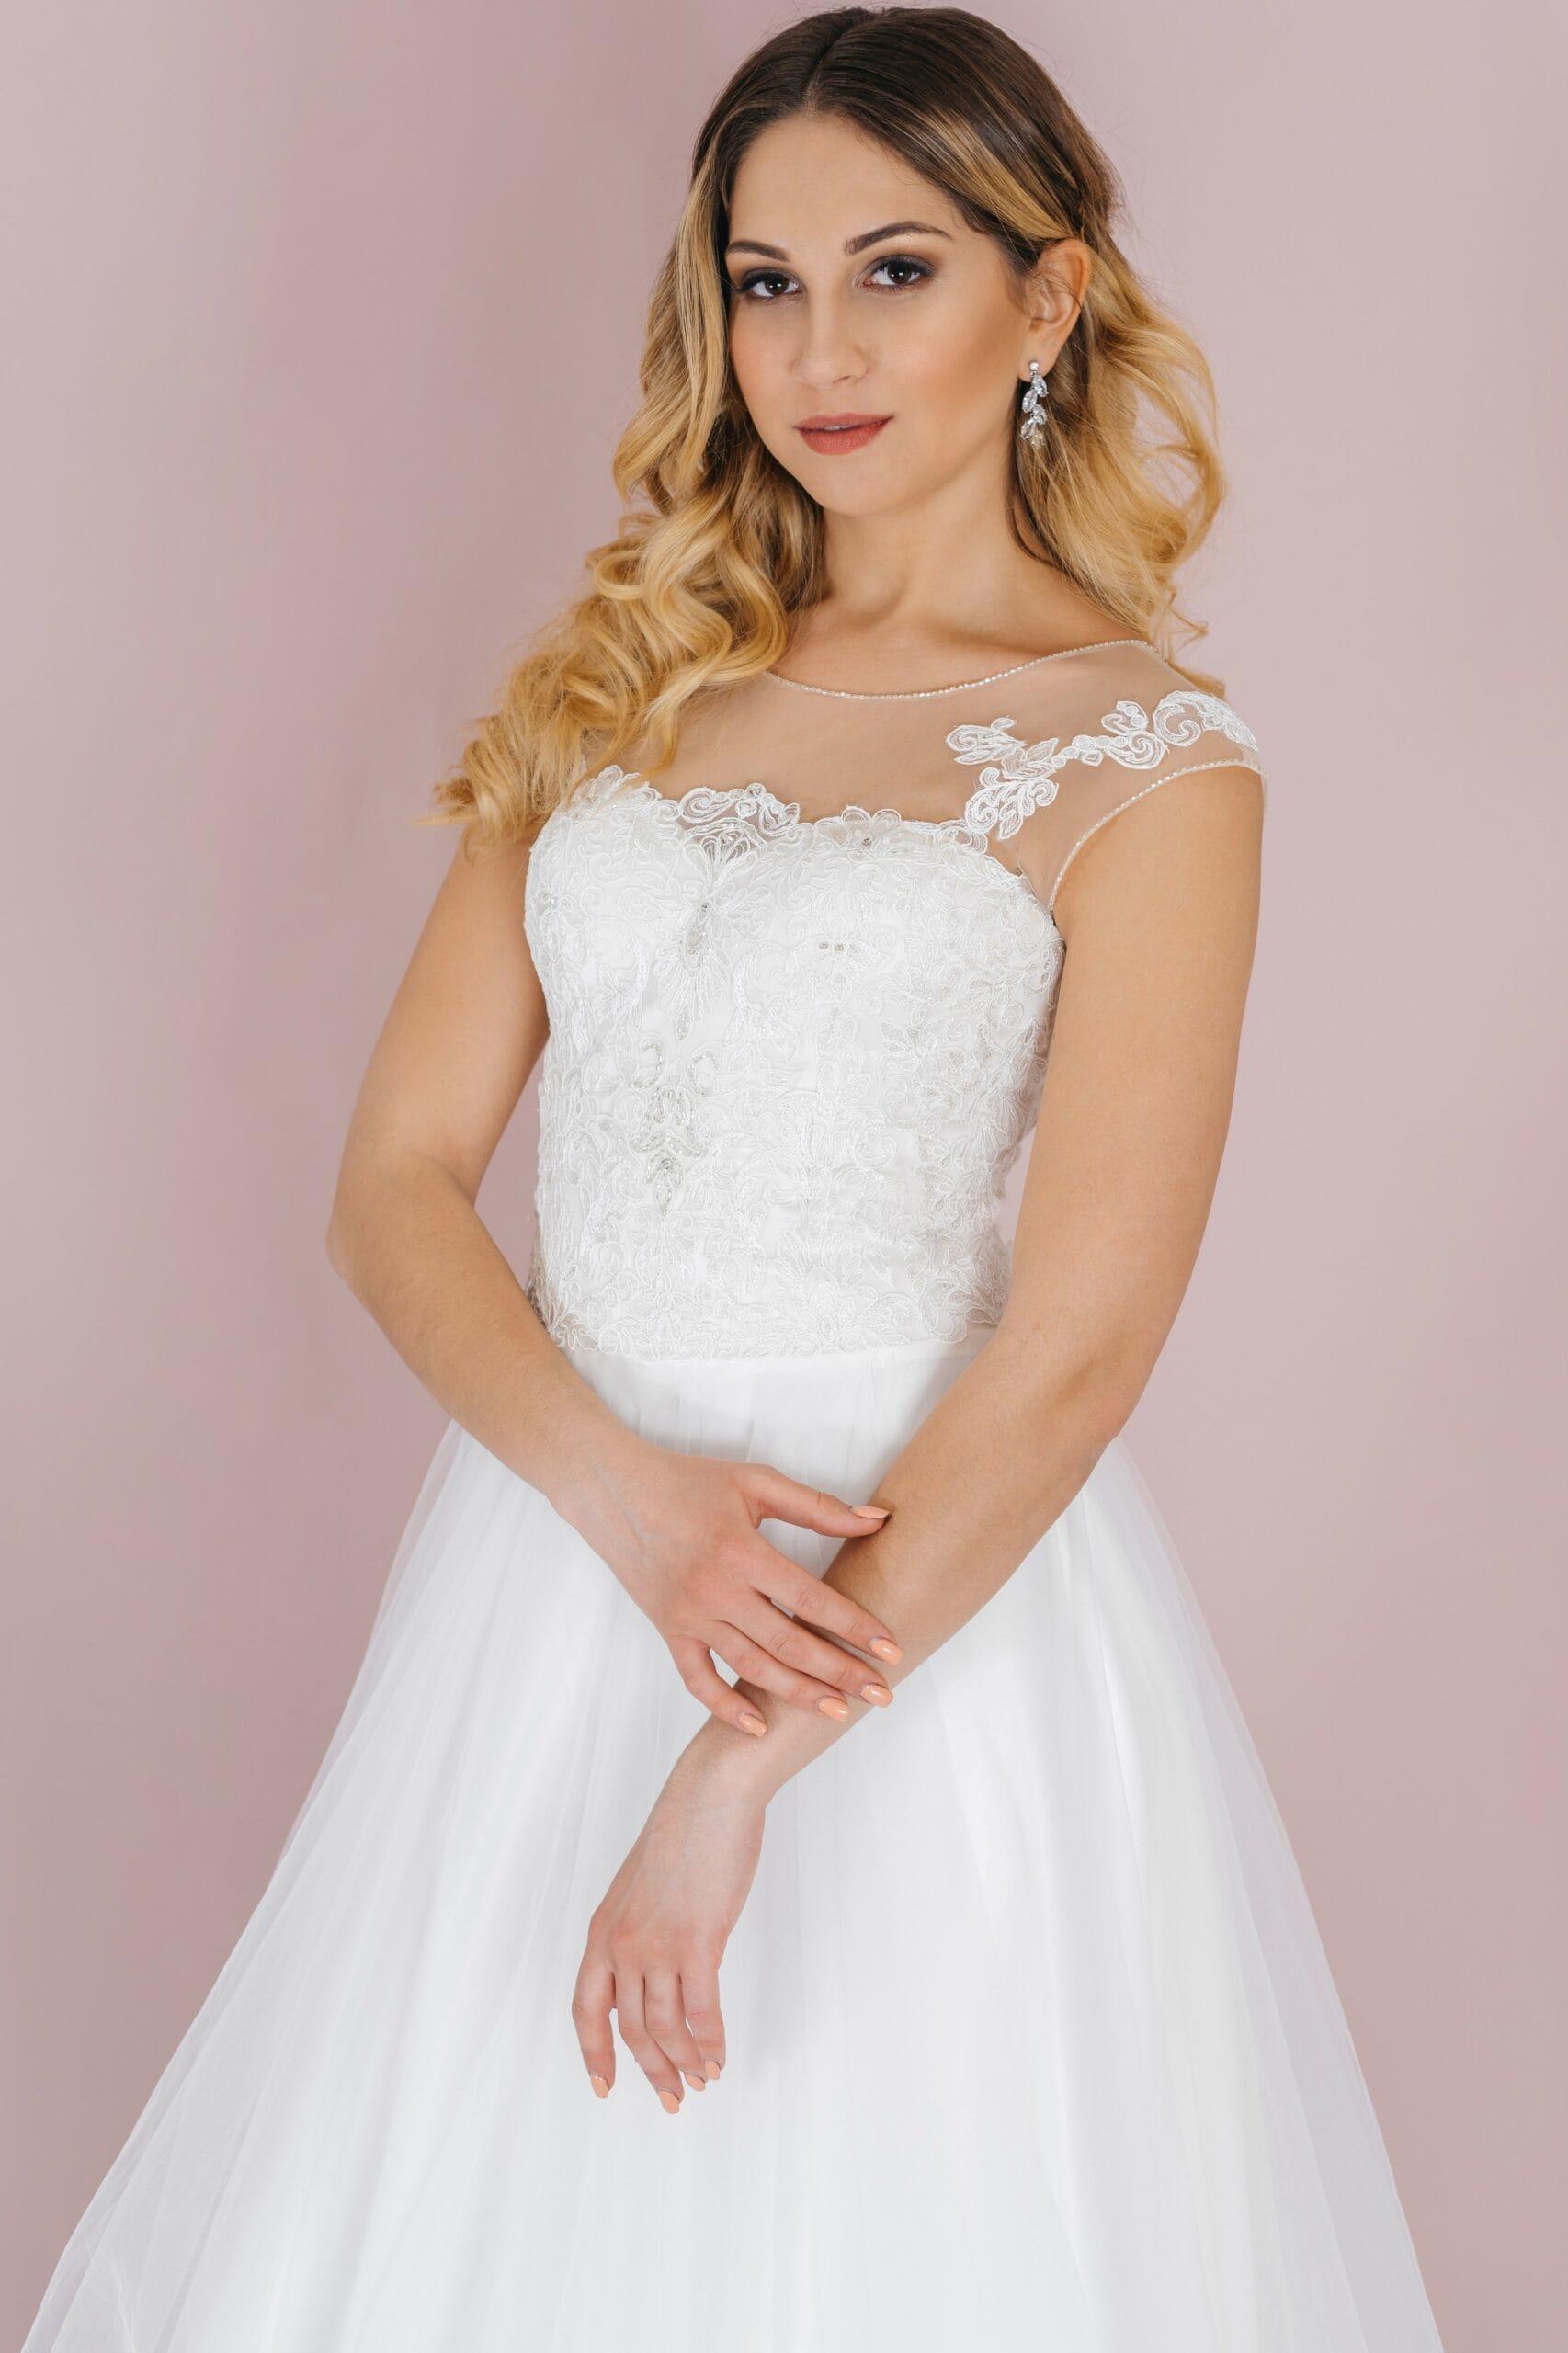 Свадебное платье MIA, коллекция LOFT, бренд RARE BRIDAL, фото 4